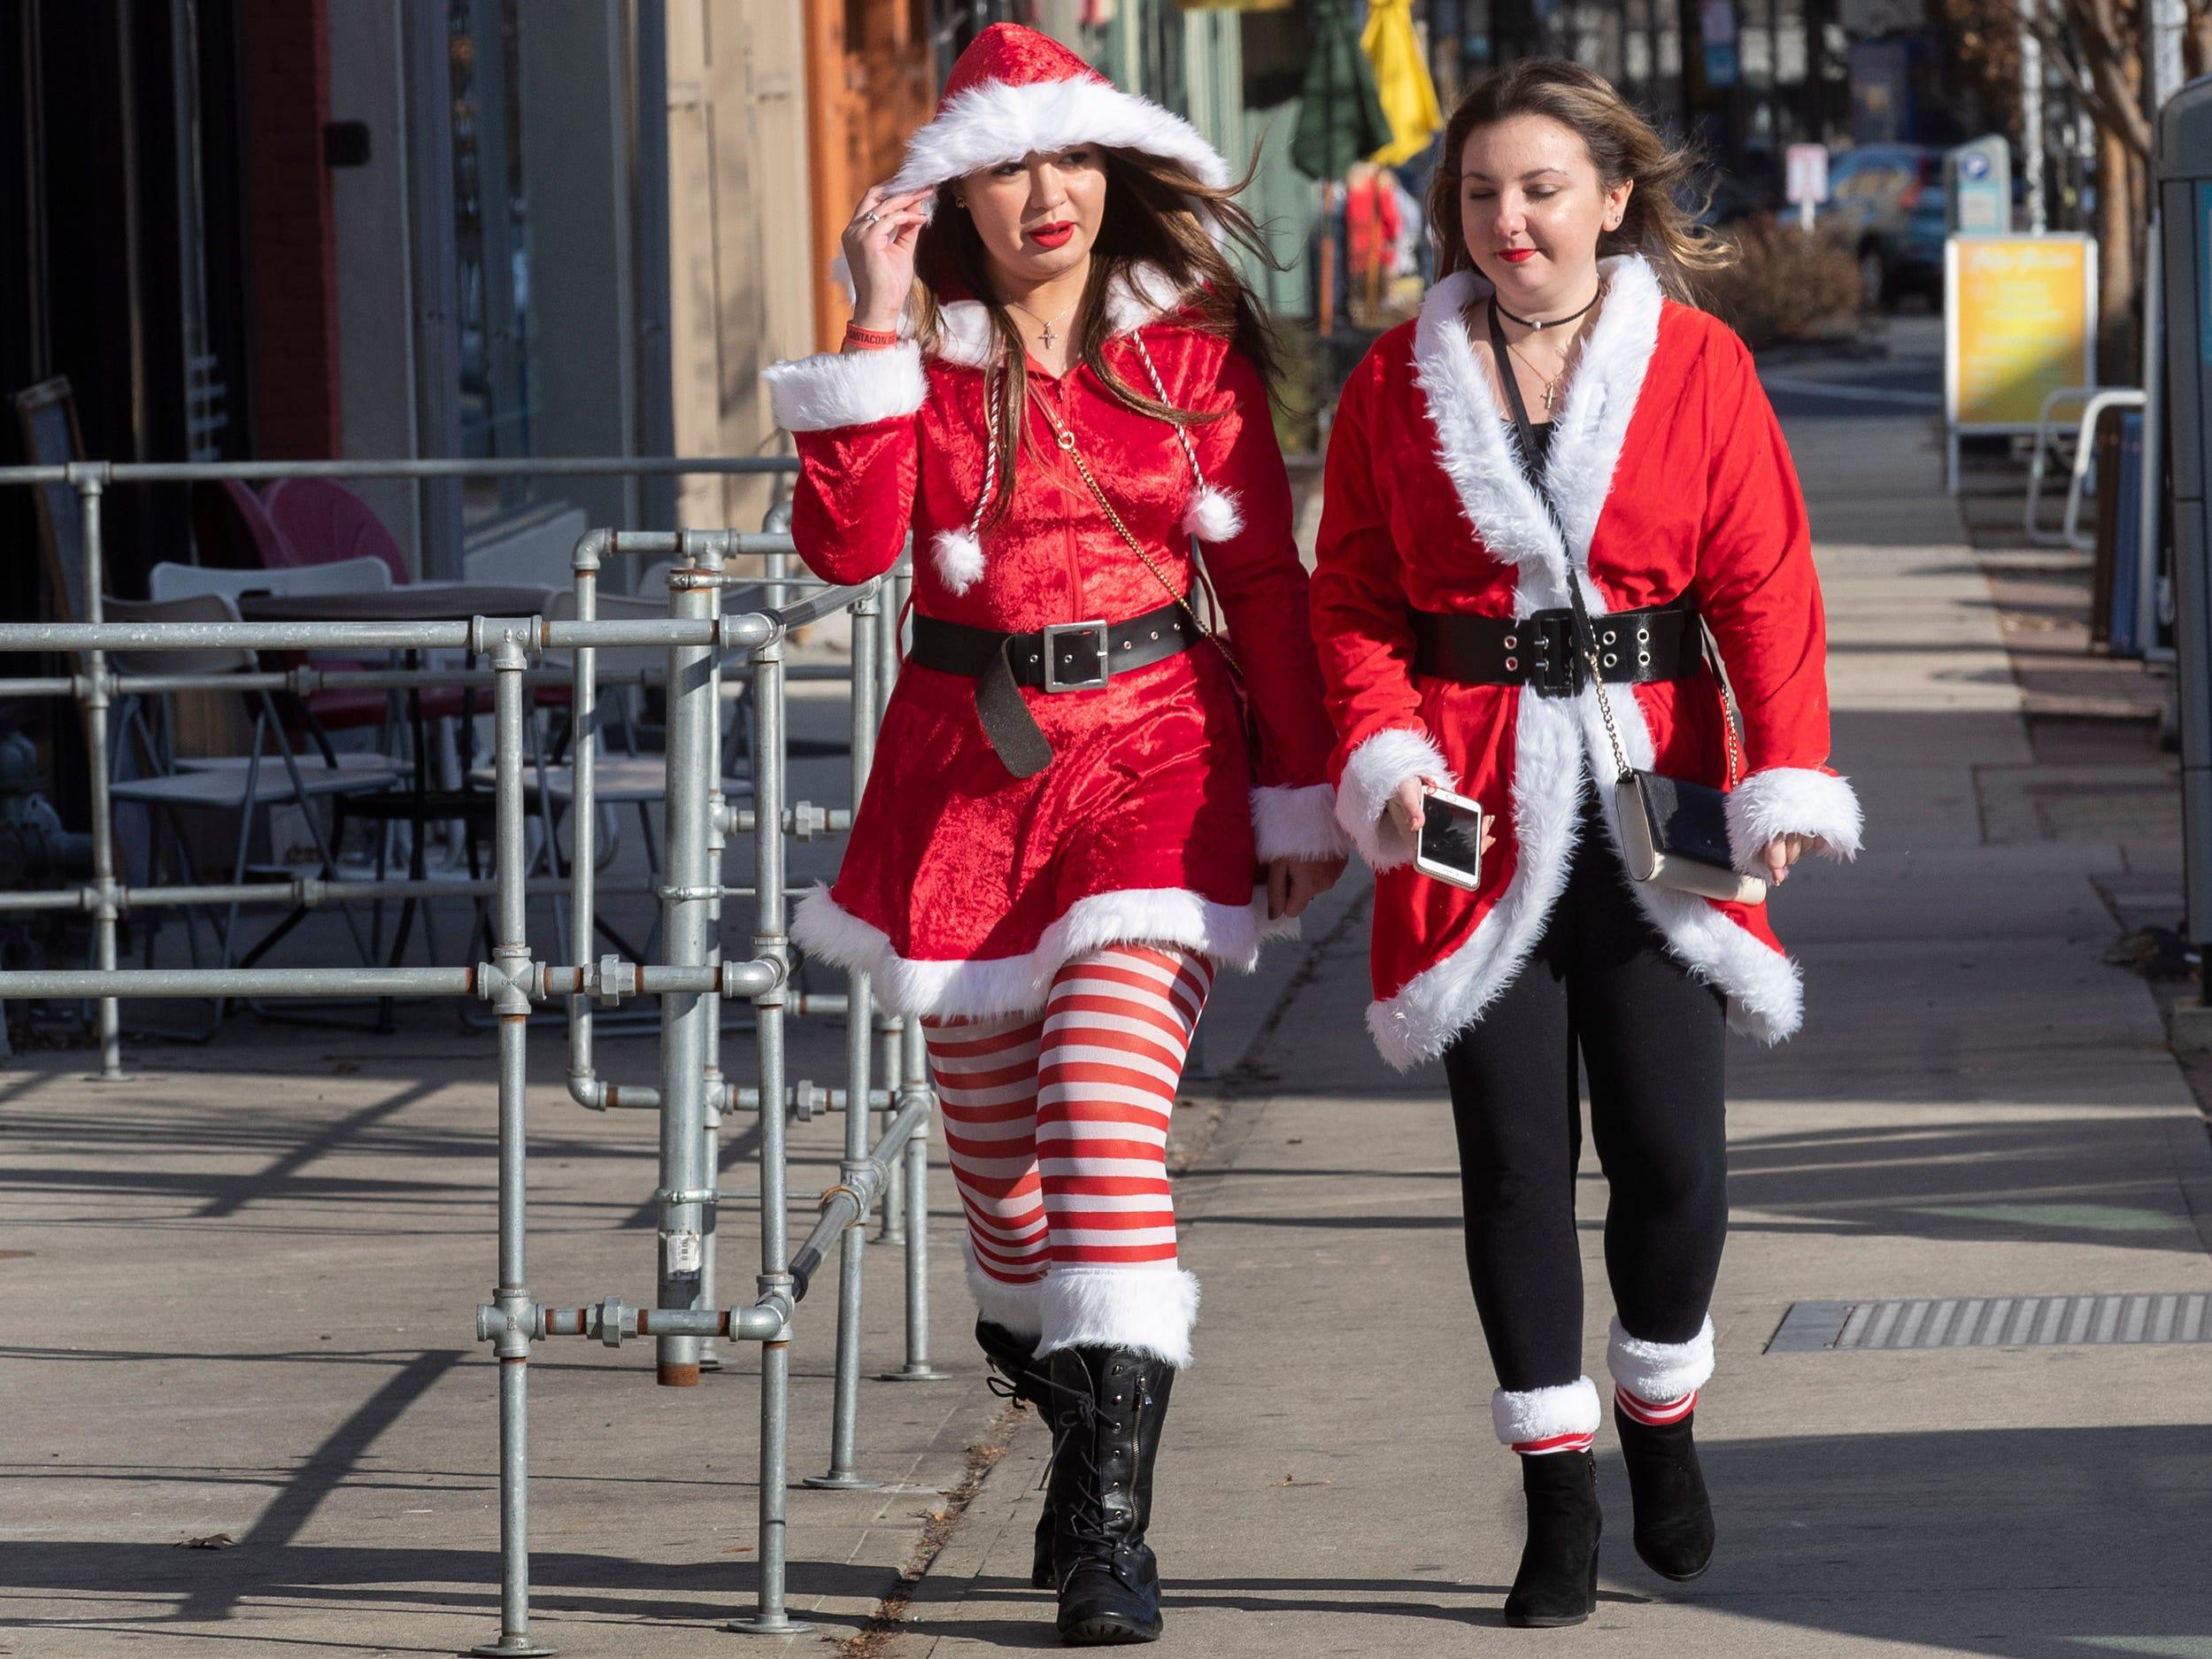 SantaCon participants head to another site as they enjoy the SantaCon Bar Crawl through Asbury Park on December 8, 2018.